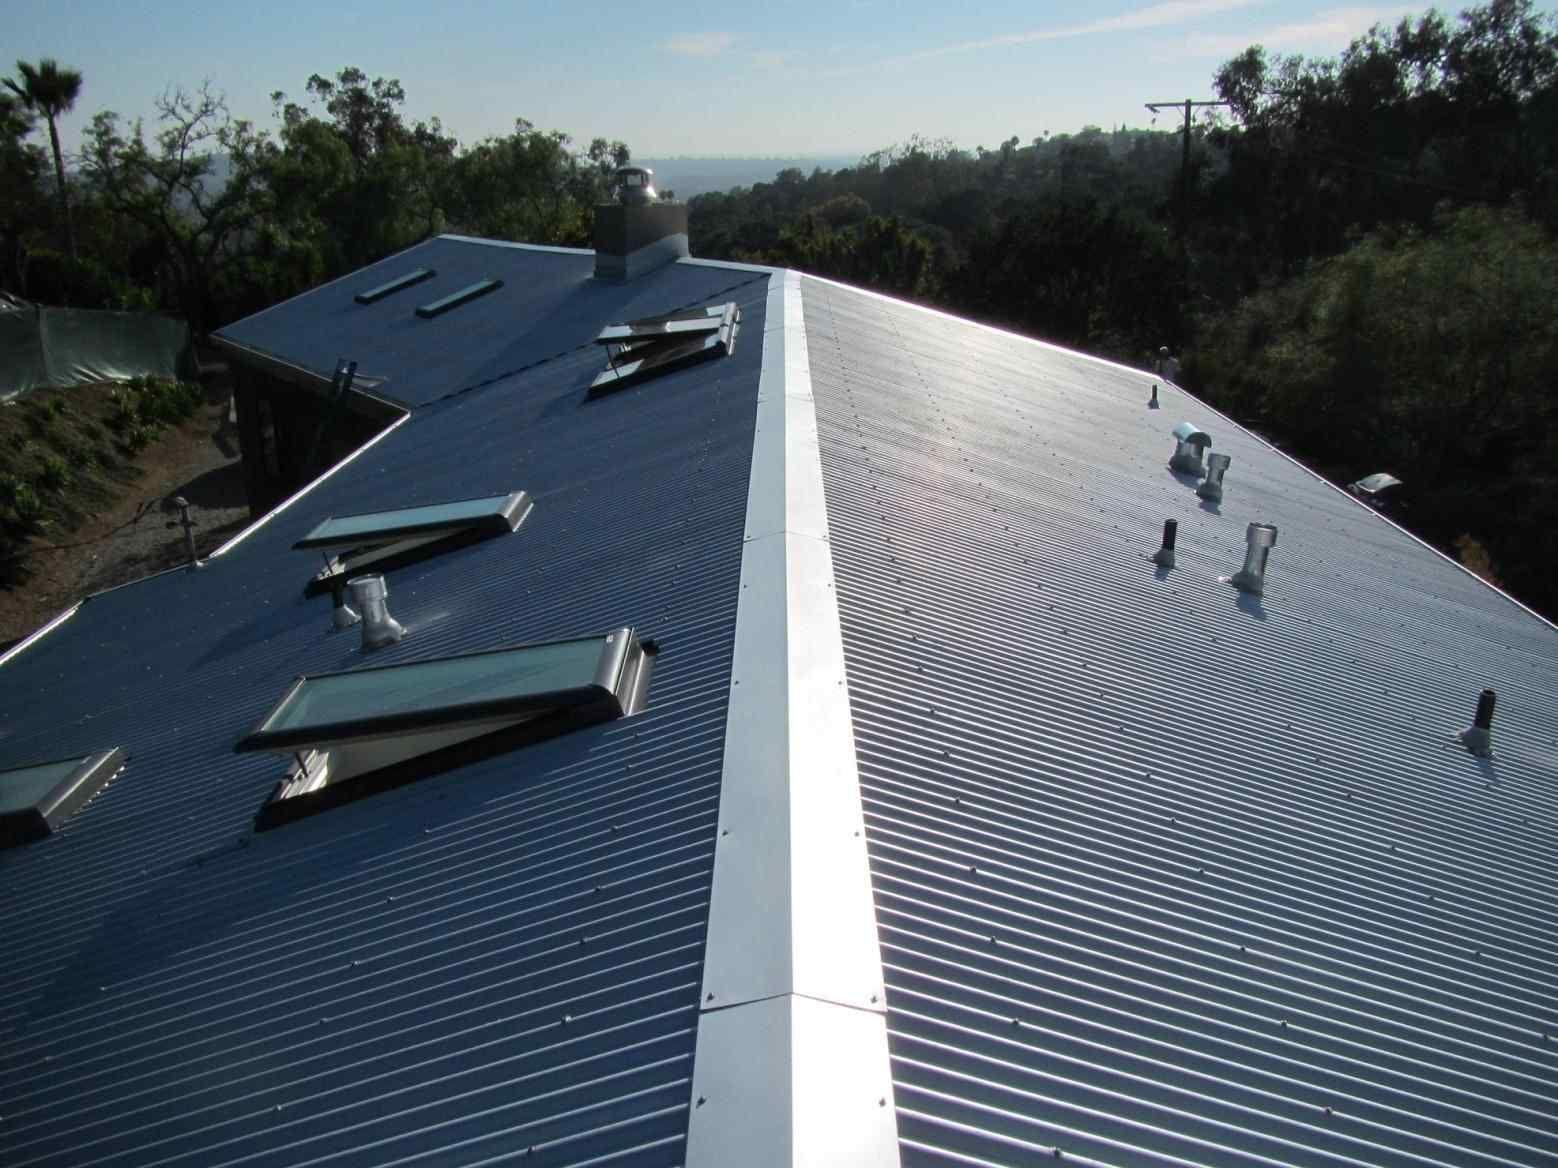 Galvanized Standing Seam Metal Roof Metal roof, Metal